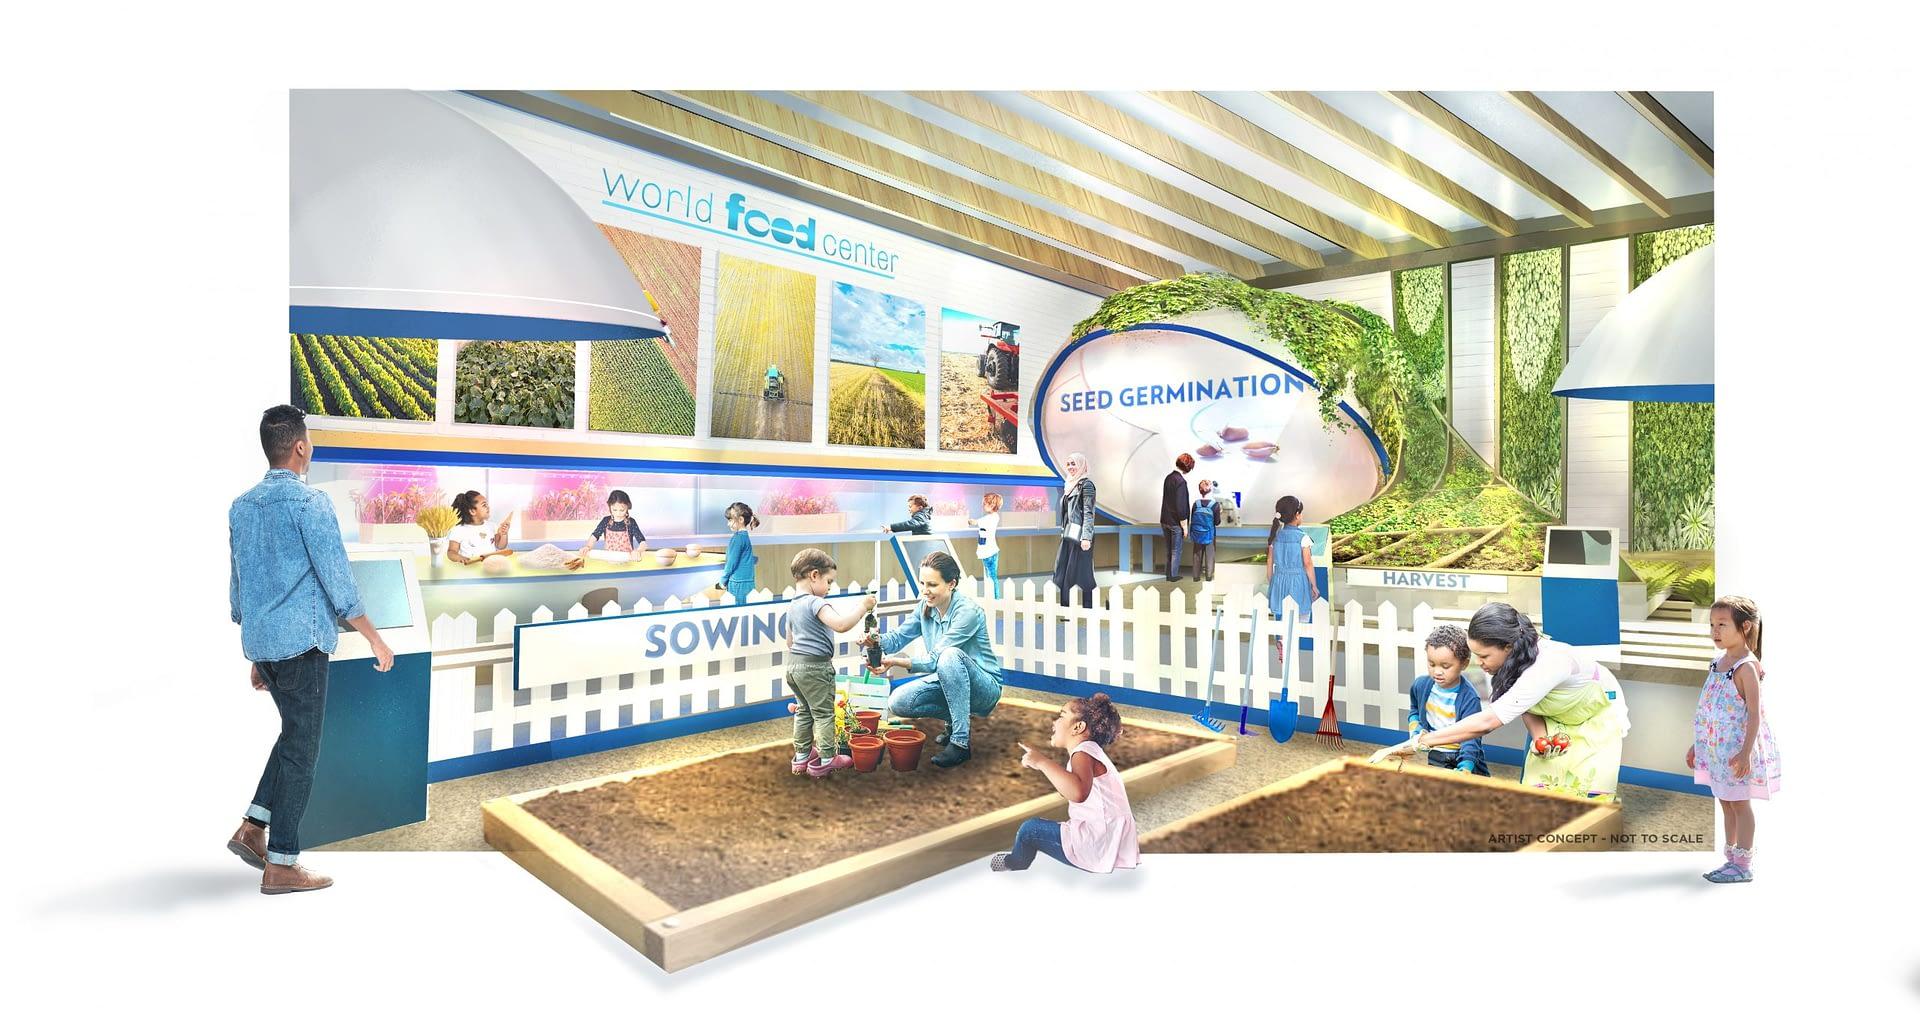 World Food Center